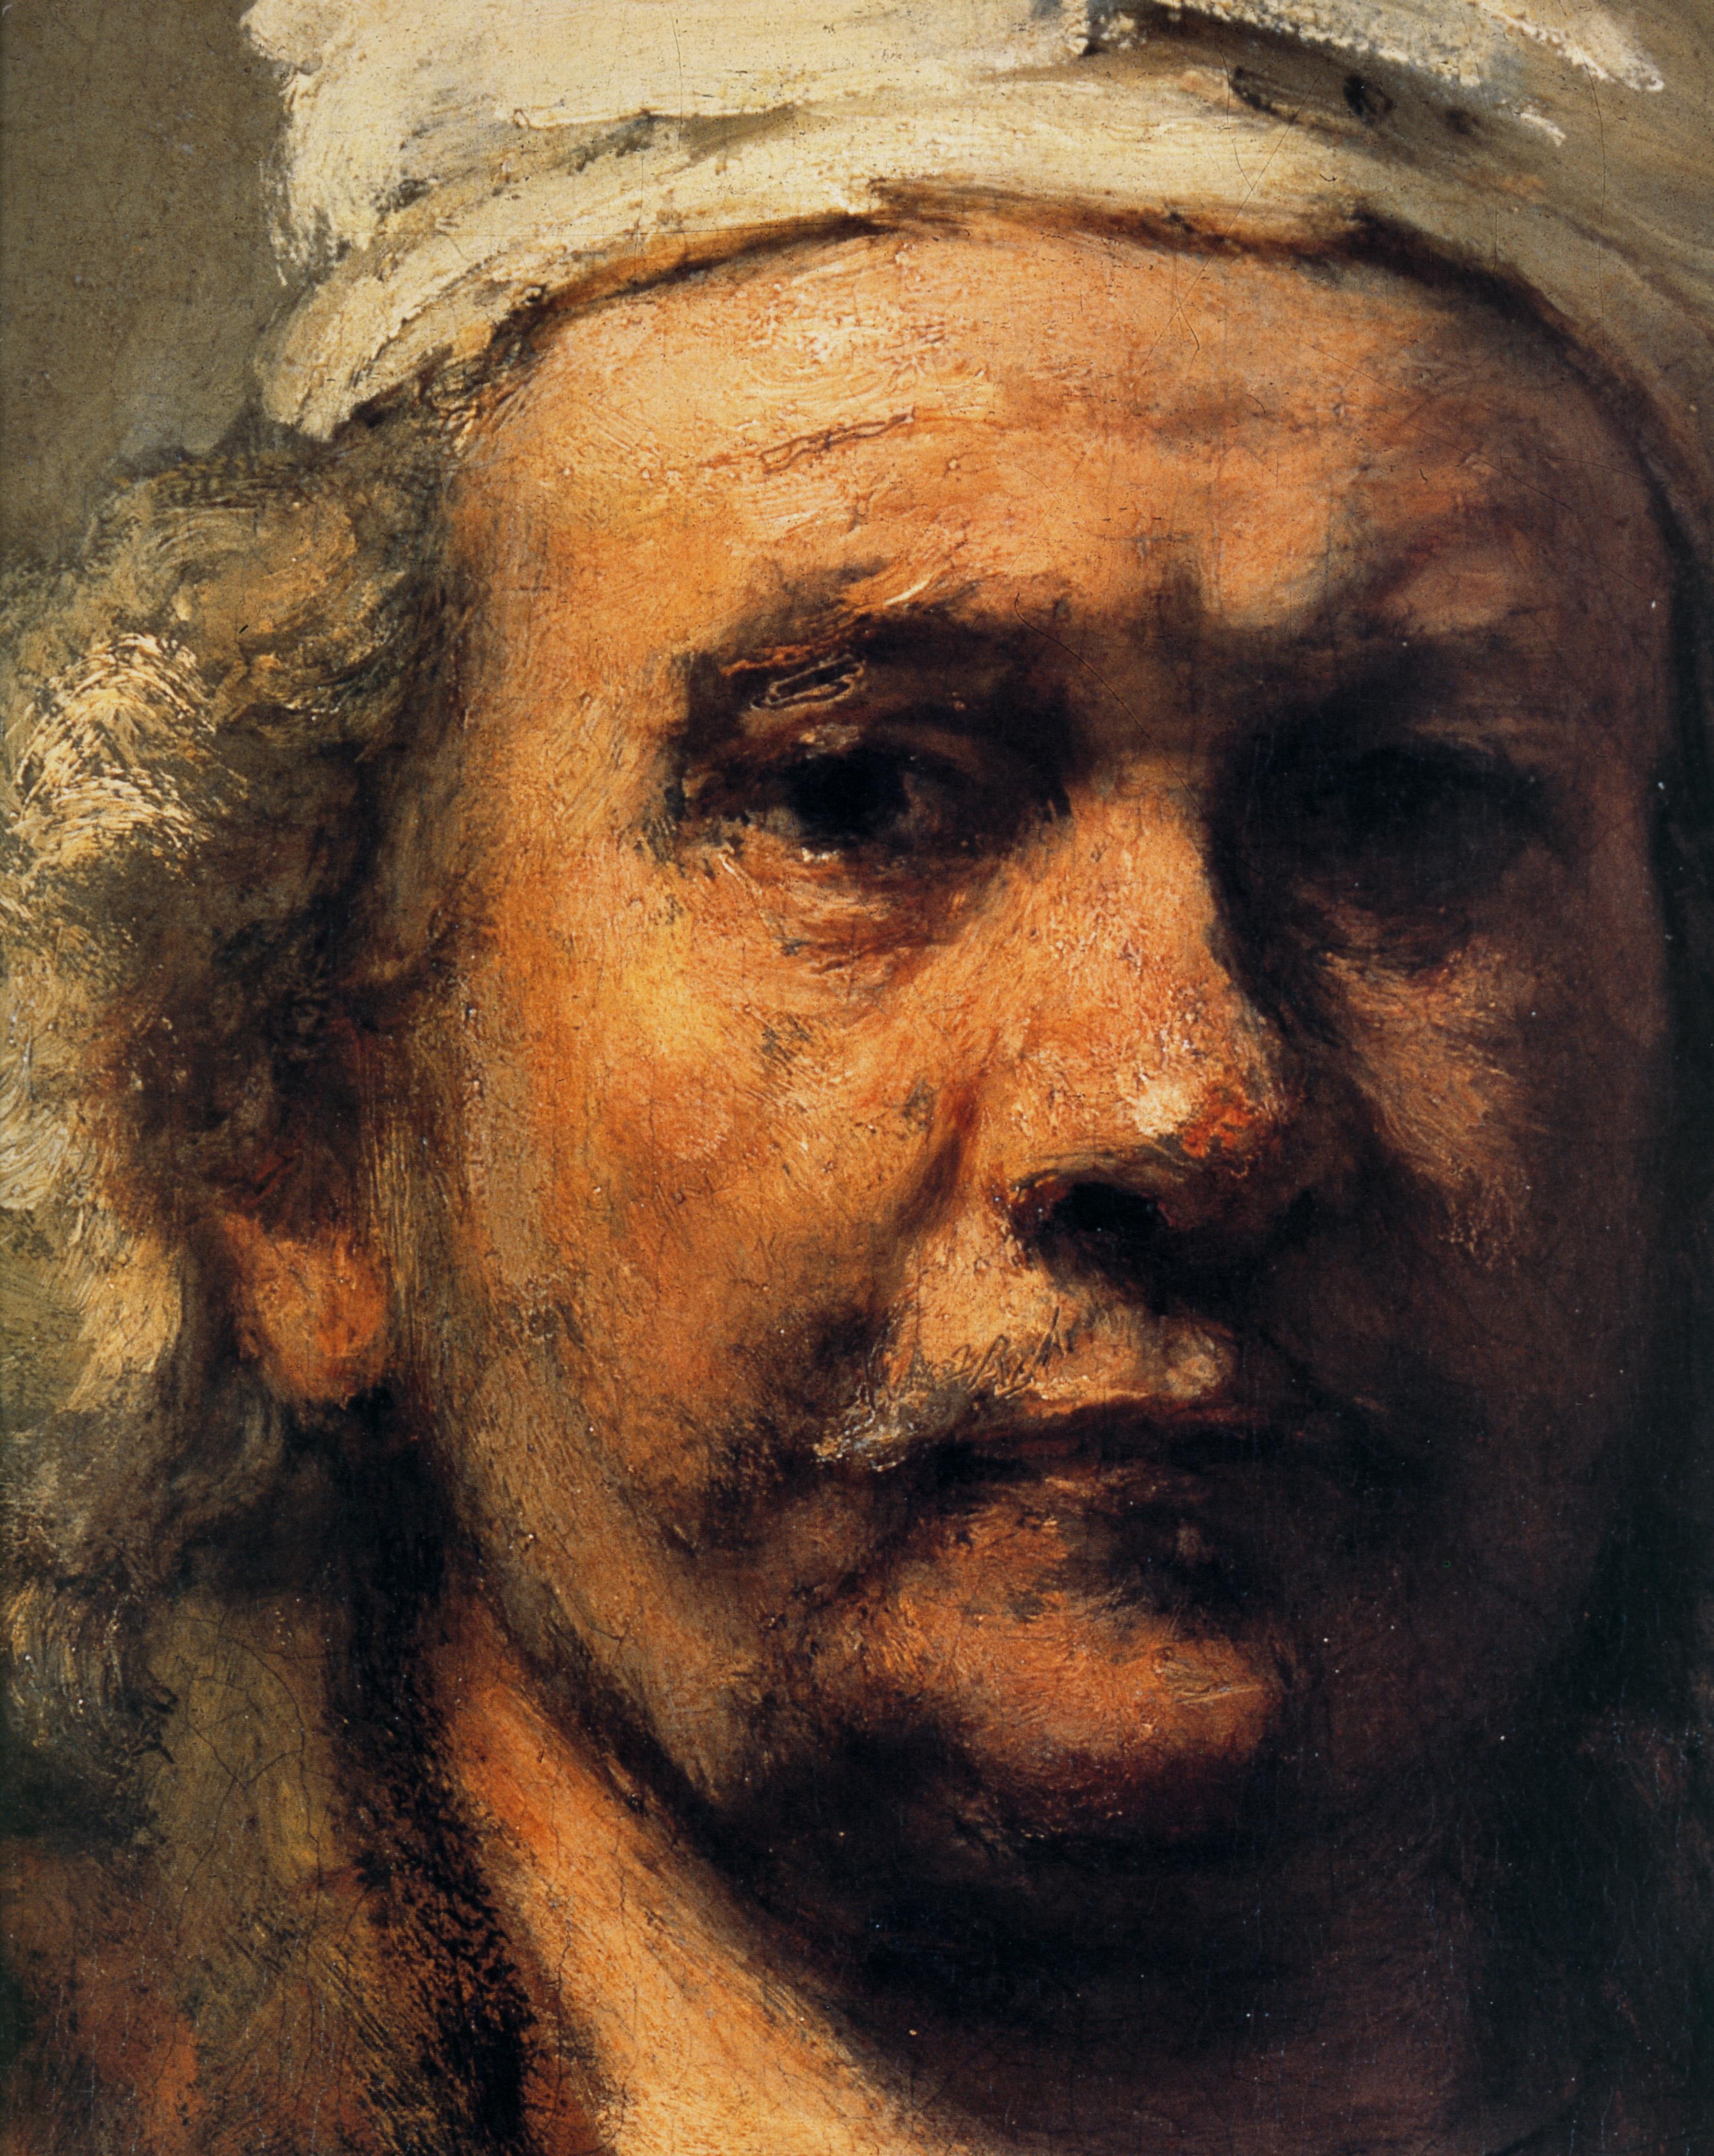 a biography of rembrandt harmenszoon van rijn the famous painter